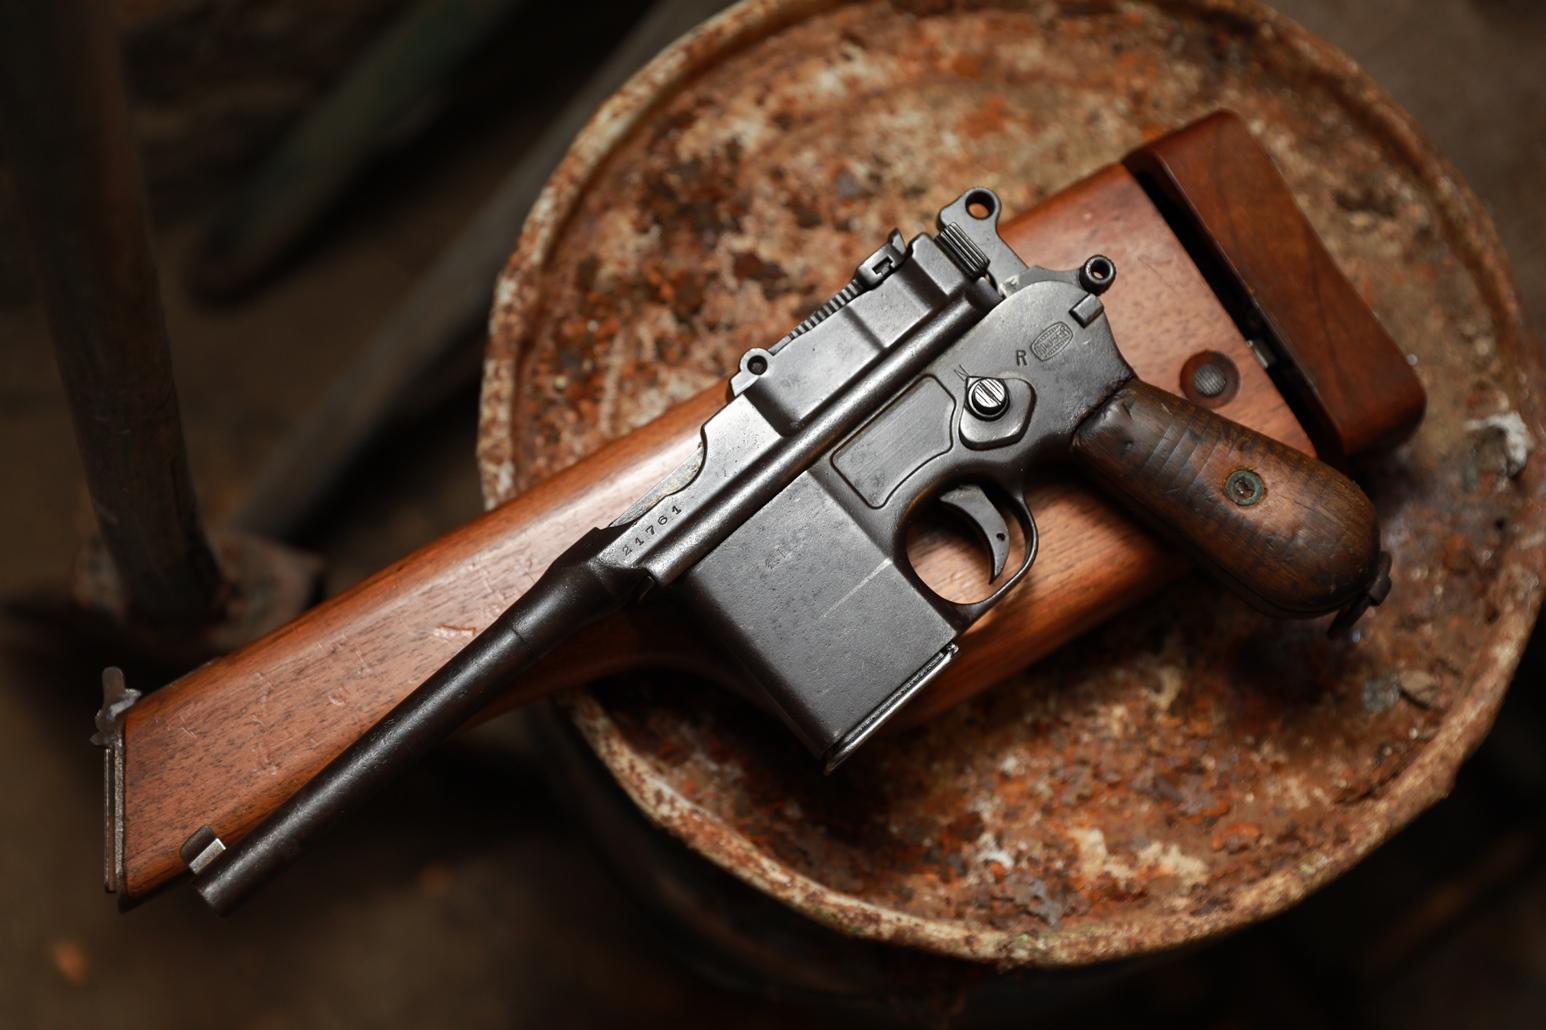 Фото Пистолет Mauser M712 Shnellfeuer #21761